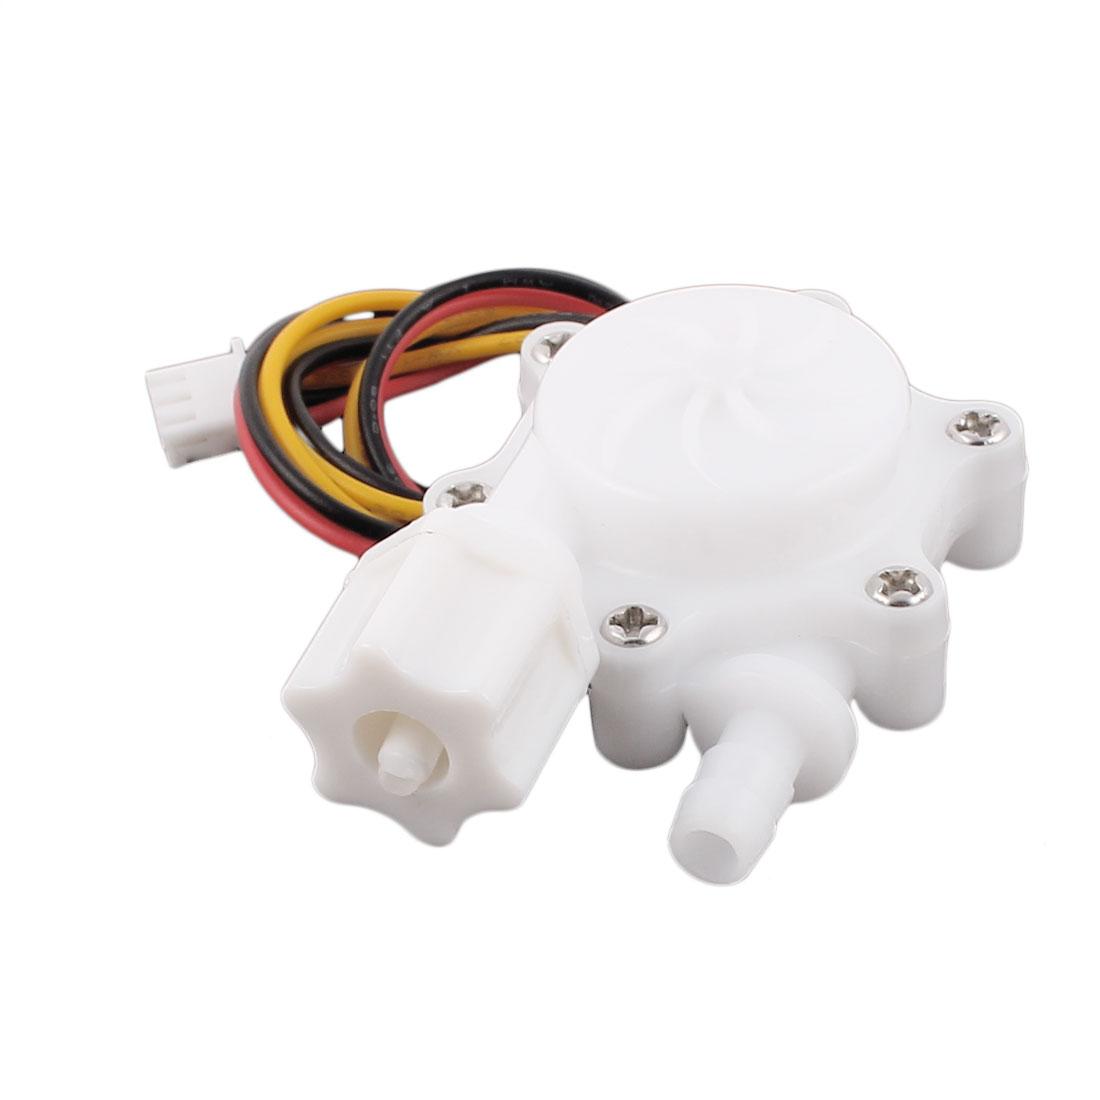 "G1/4"" 6mm DC5V Thread Hall Effect Water Flow Sensor Switch Flowmeter 0.15-1.5L/M - image 5 of 5"